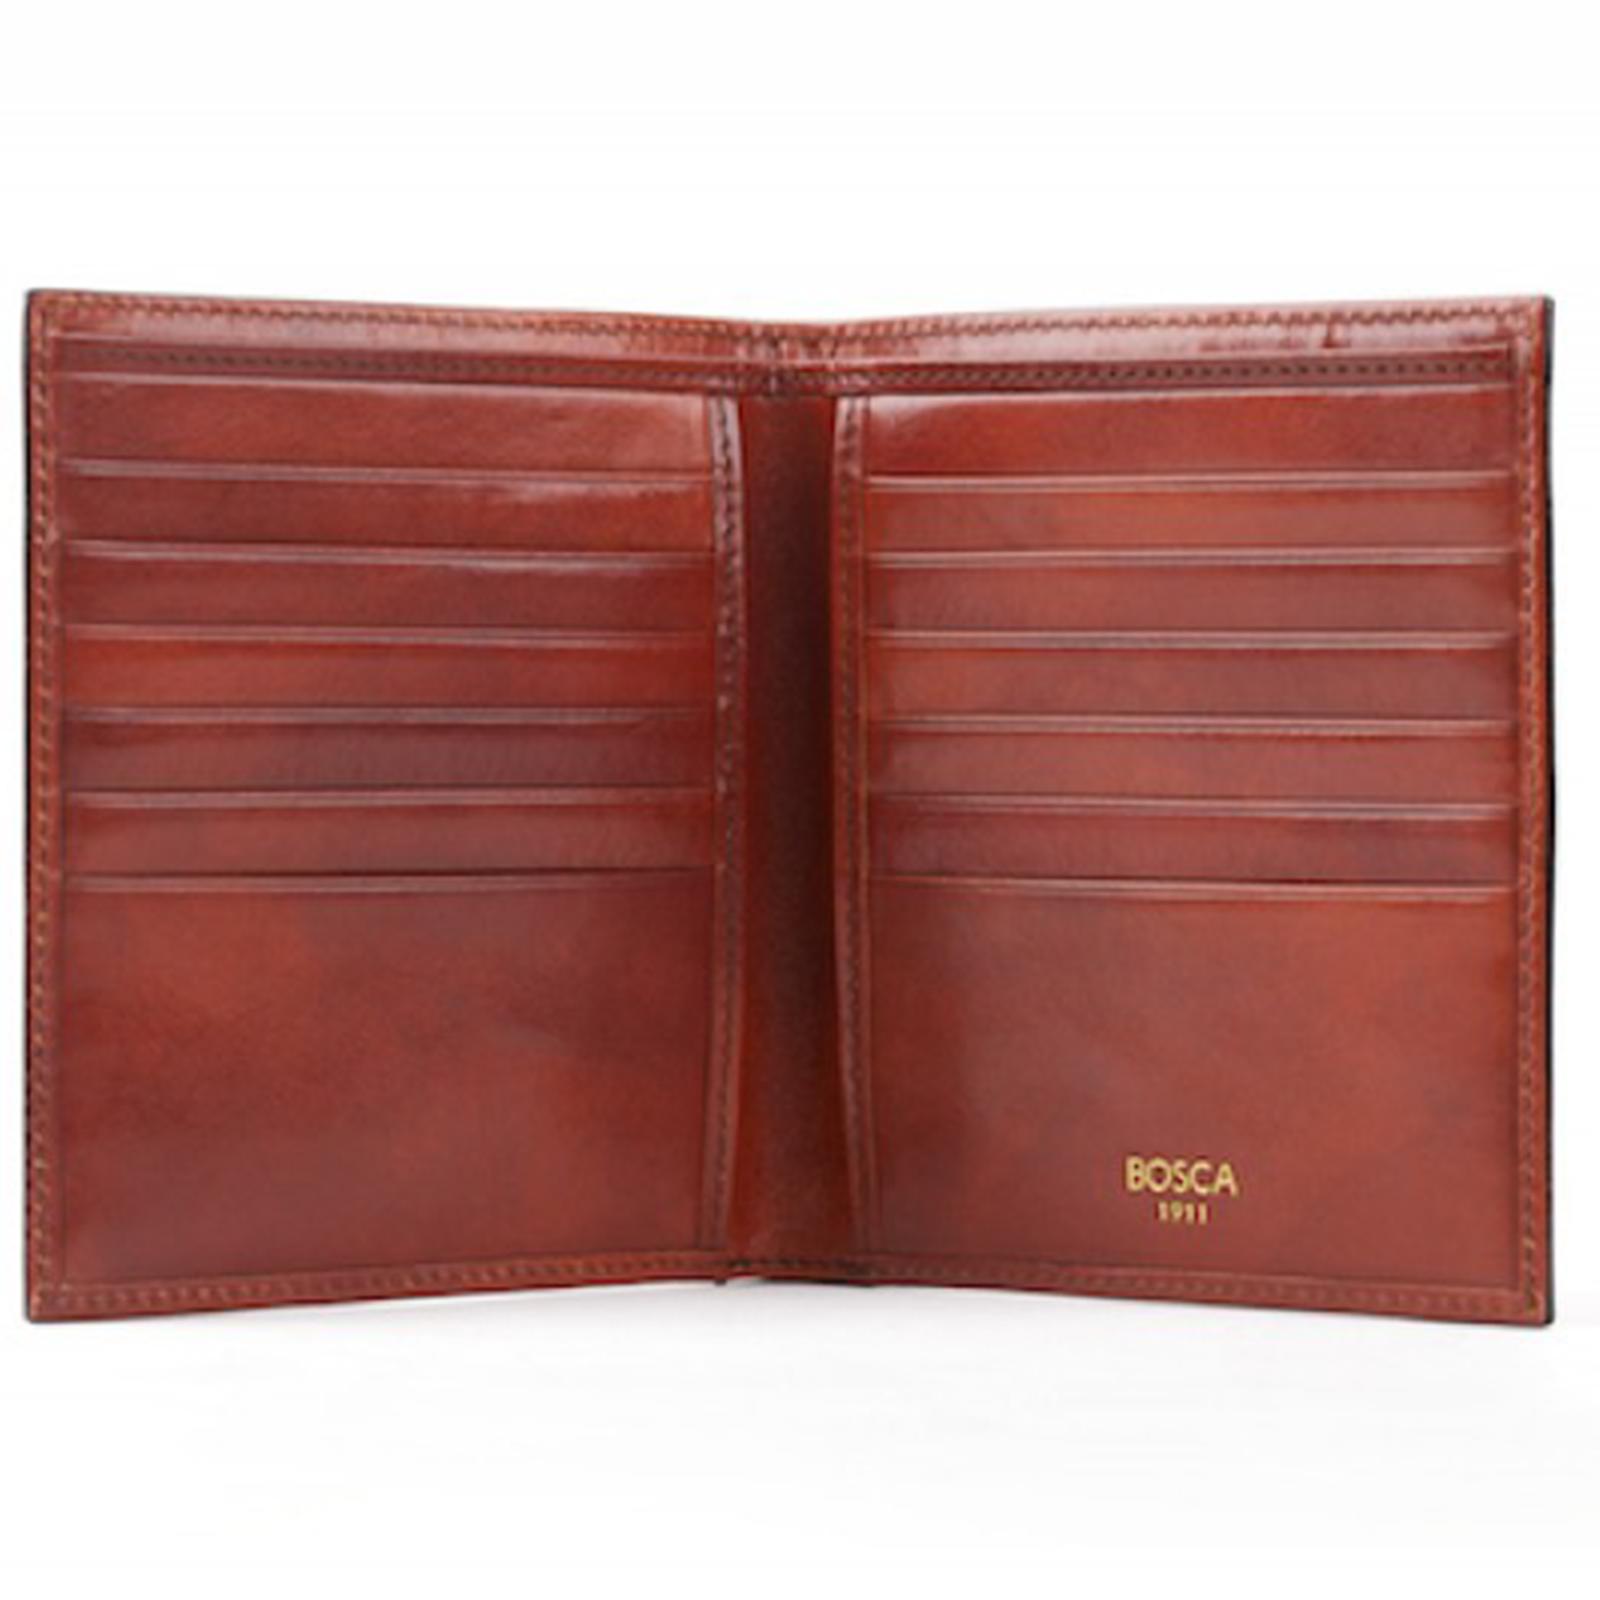 bosca leather coin purse